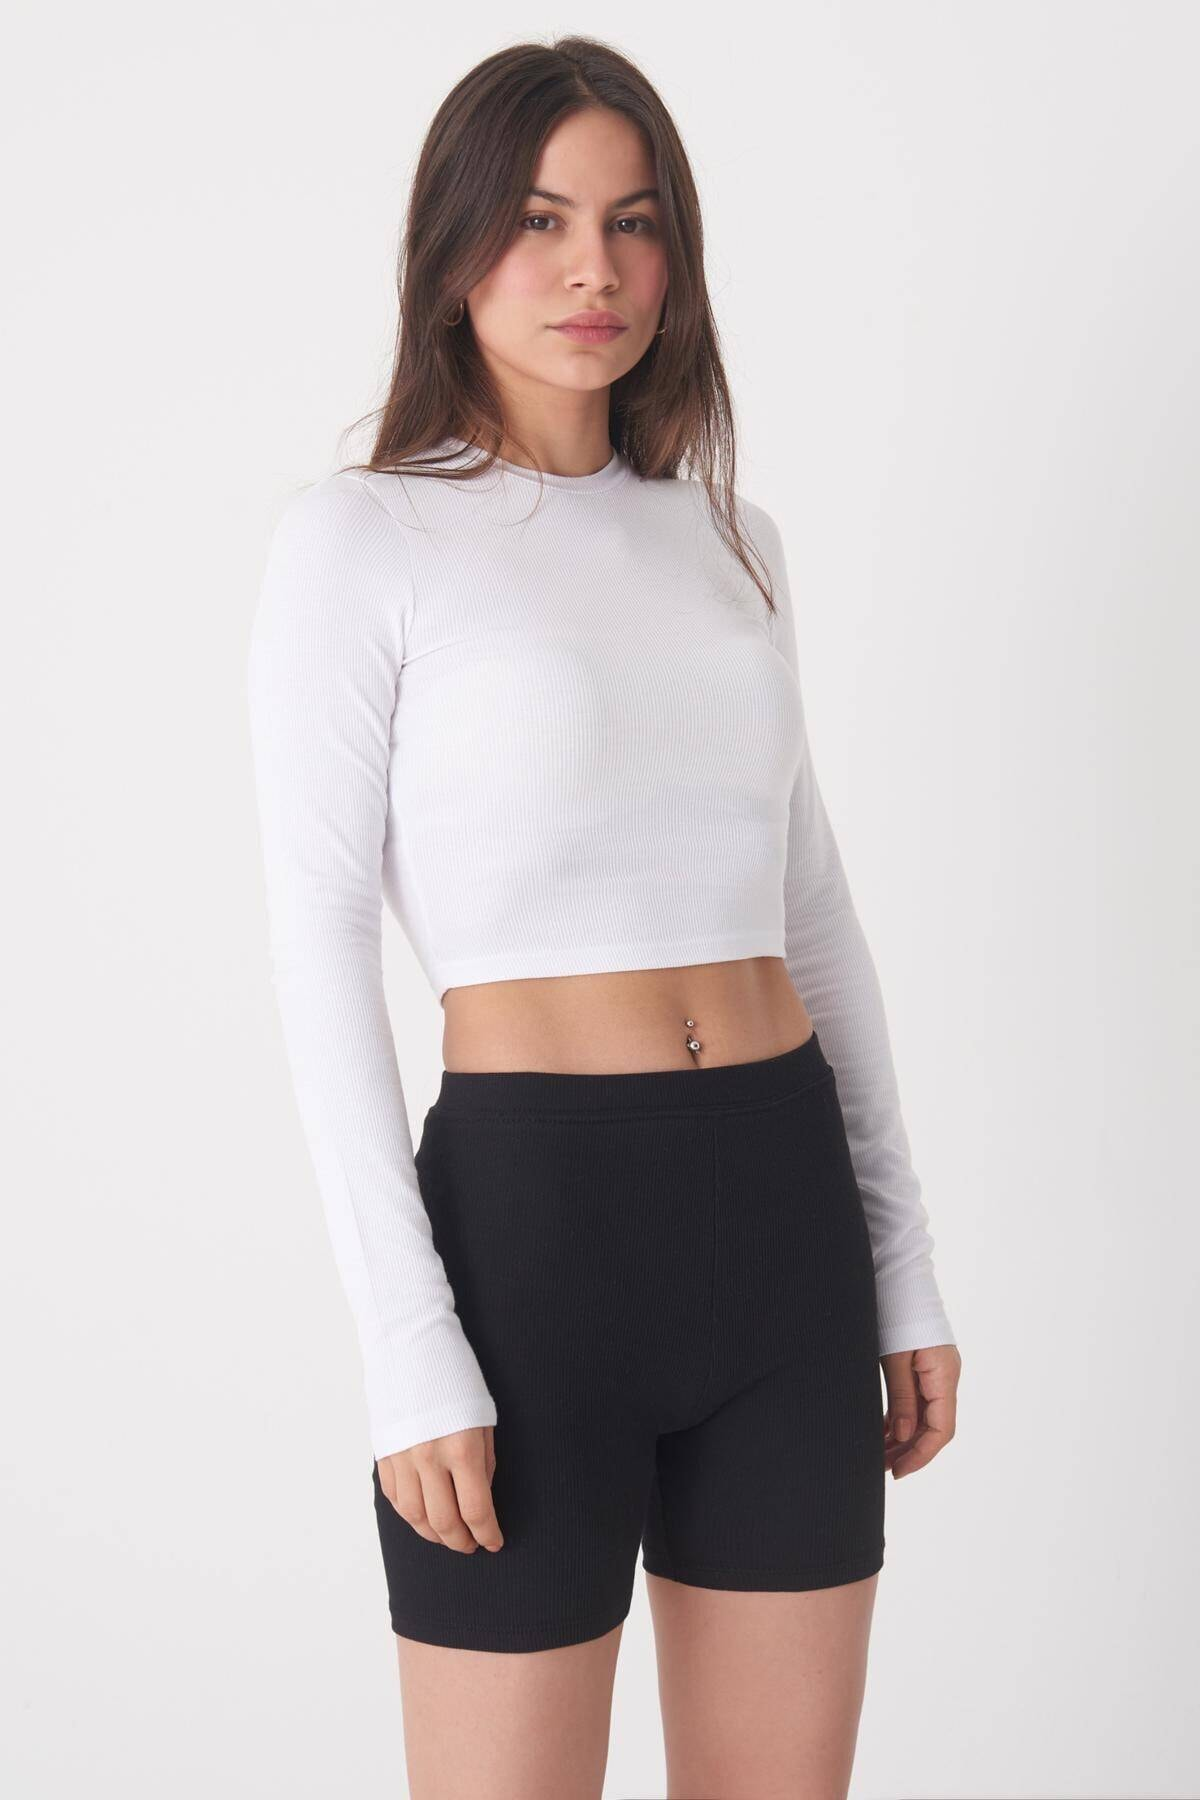 Addax Kadın Beyaz Uzun Kollu Bluz P1017 - K12 ADX-0000022662 4